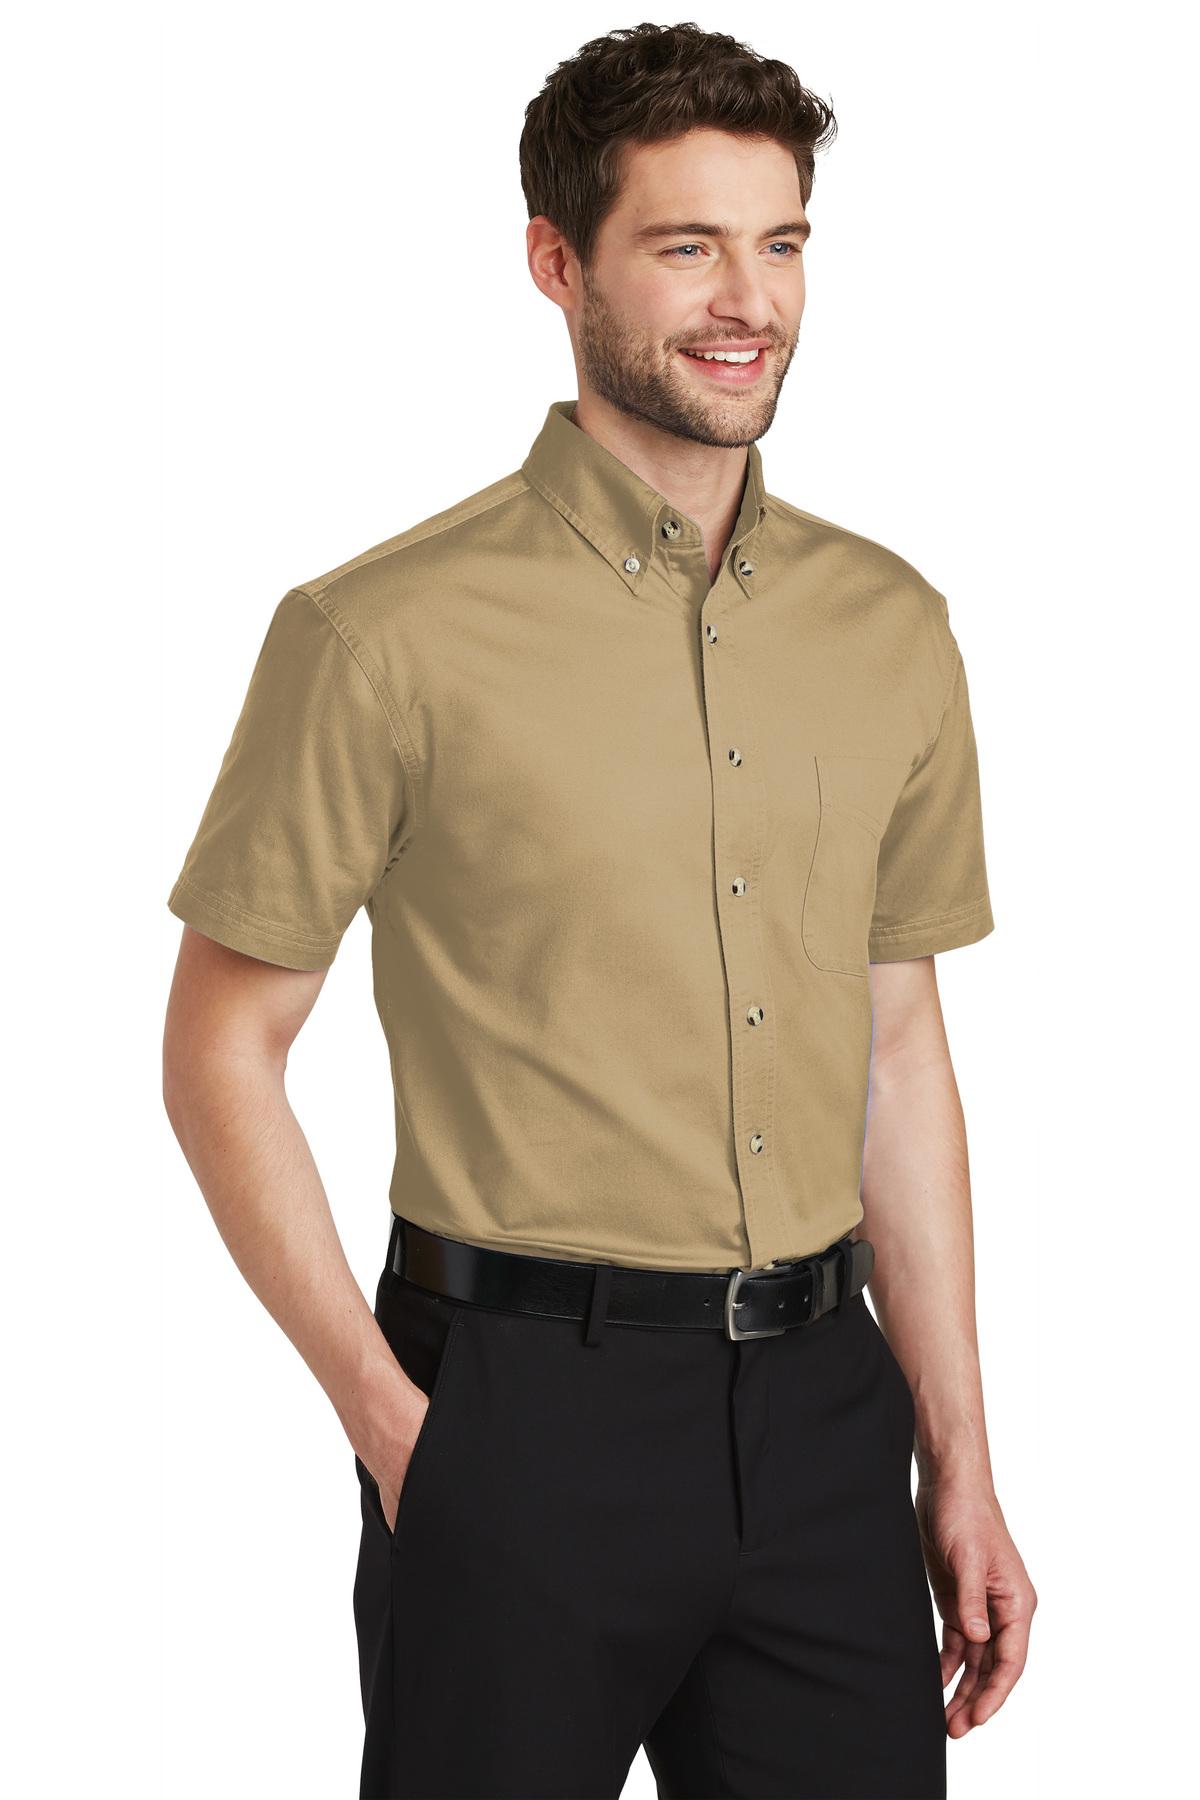 Port Authority Mens Long Sleeve Twill Shirt 4XL White